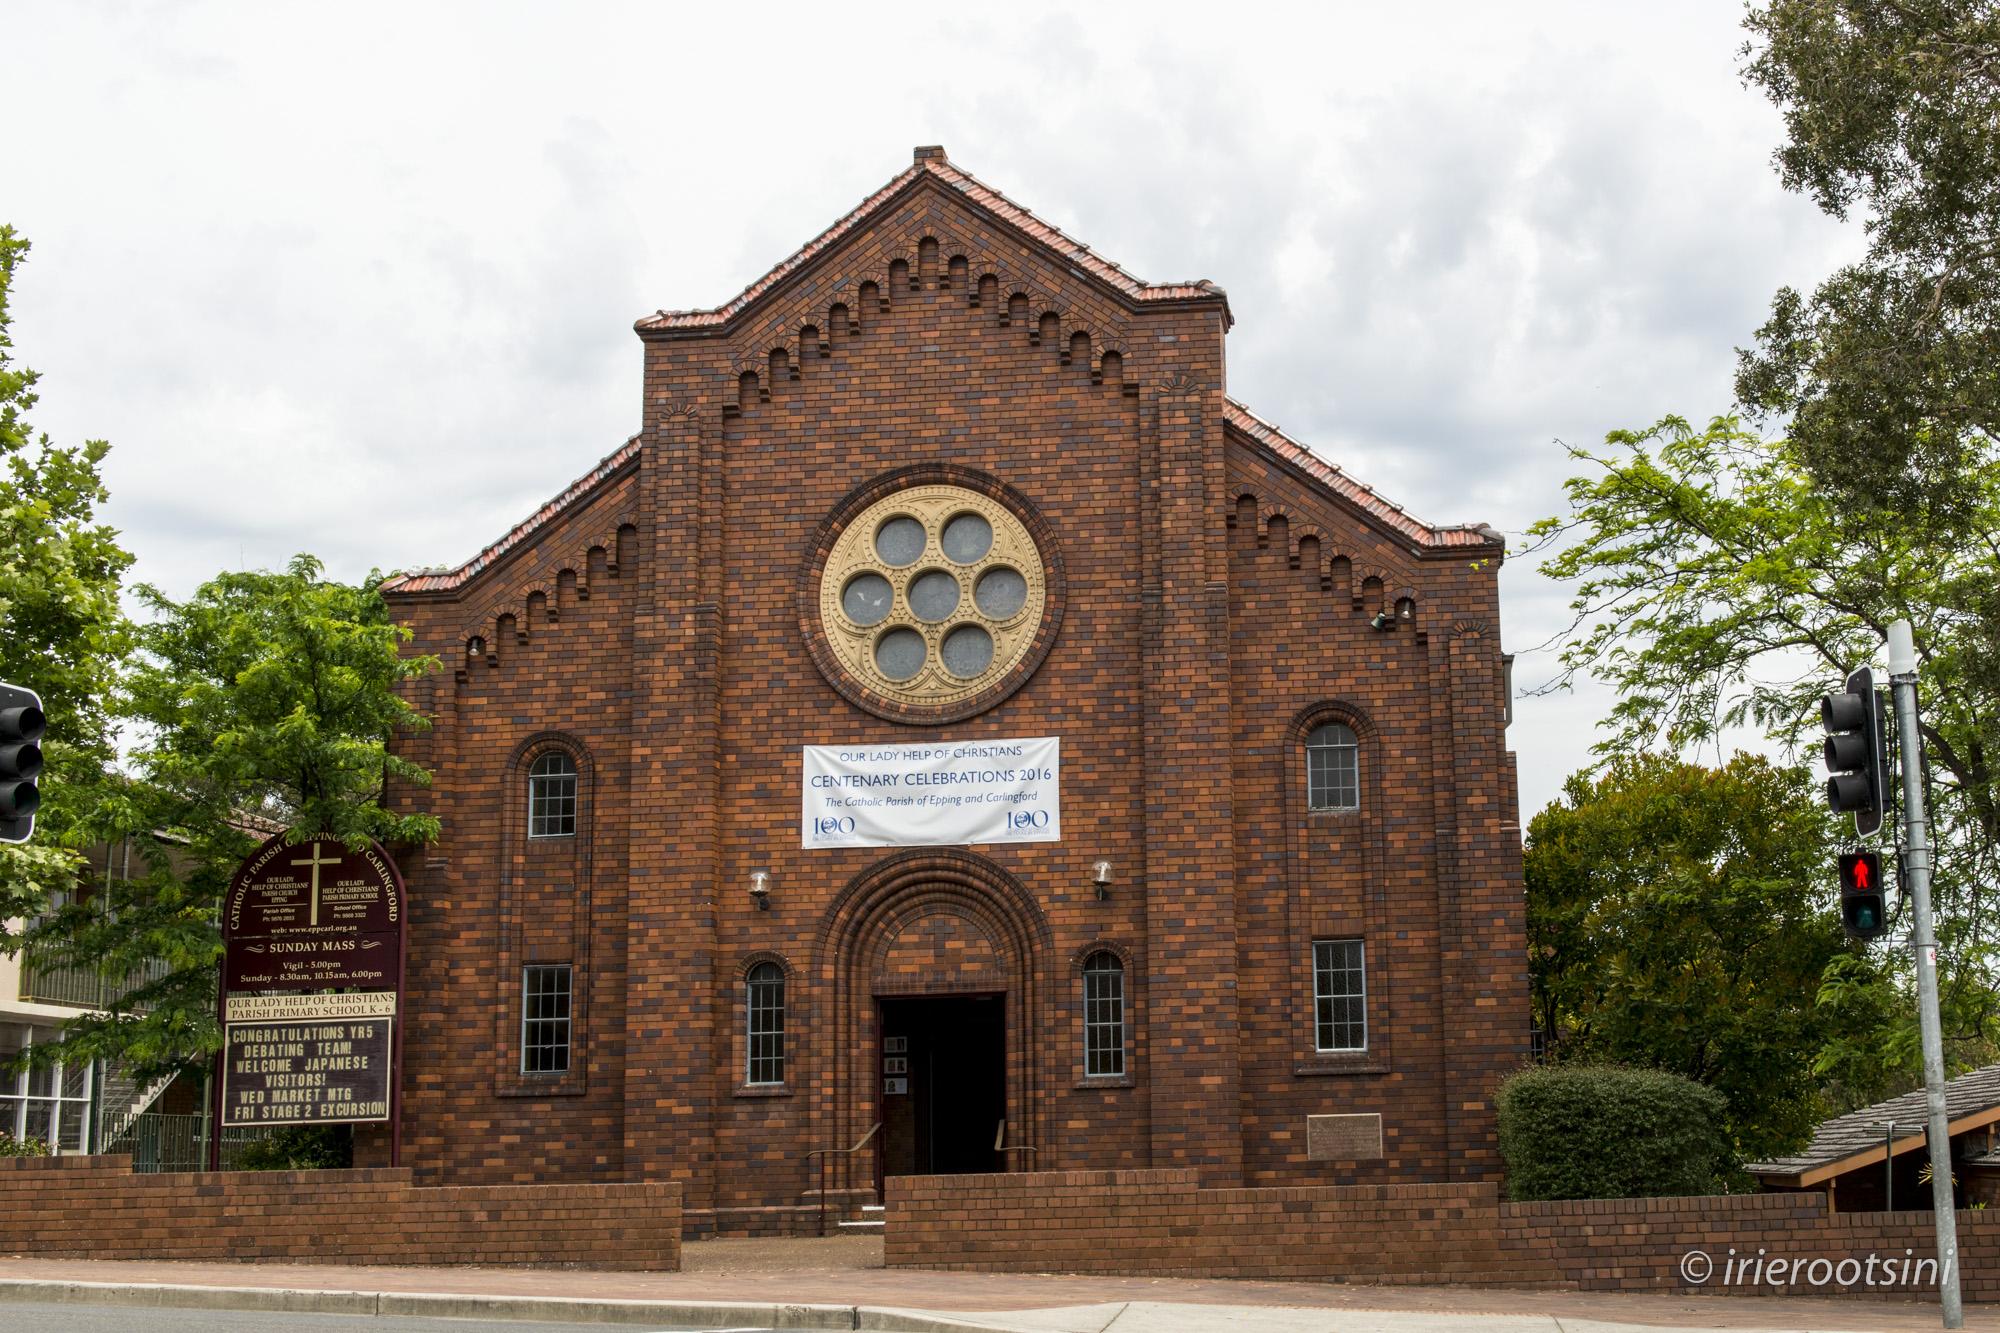 Our Lady Help of Christians Parish Church Facade